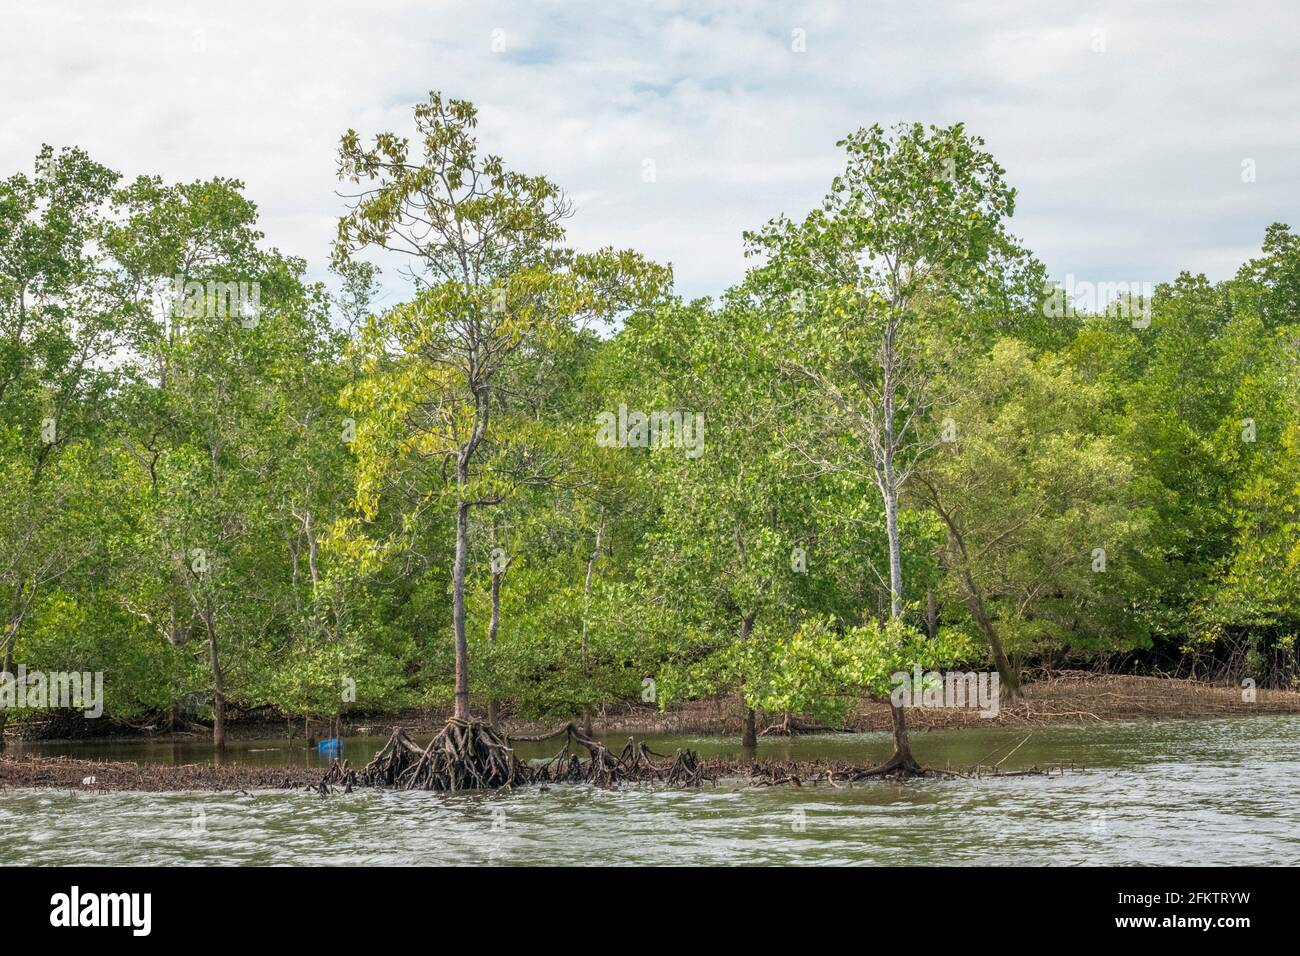 Kreuzfahrt entlang des Sibu Laut-Telaga Air Flussufers, Matang, Sarawak, Malaysia Stockfoto